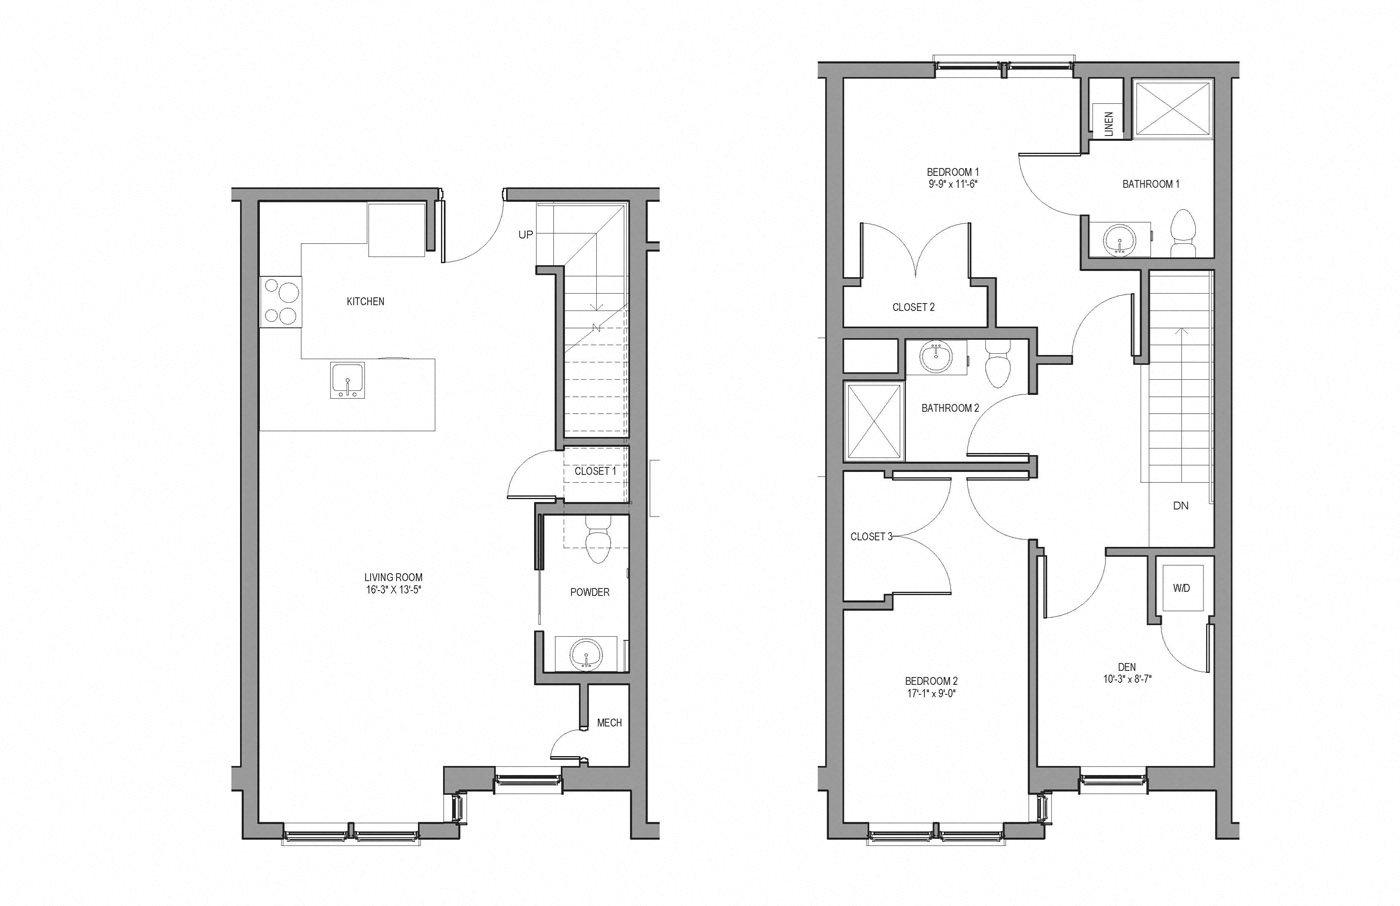 floor plans of metromark in boston ma